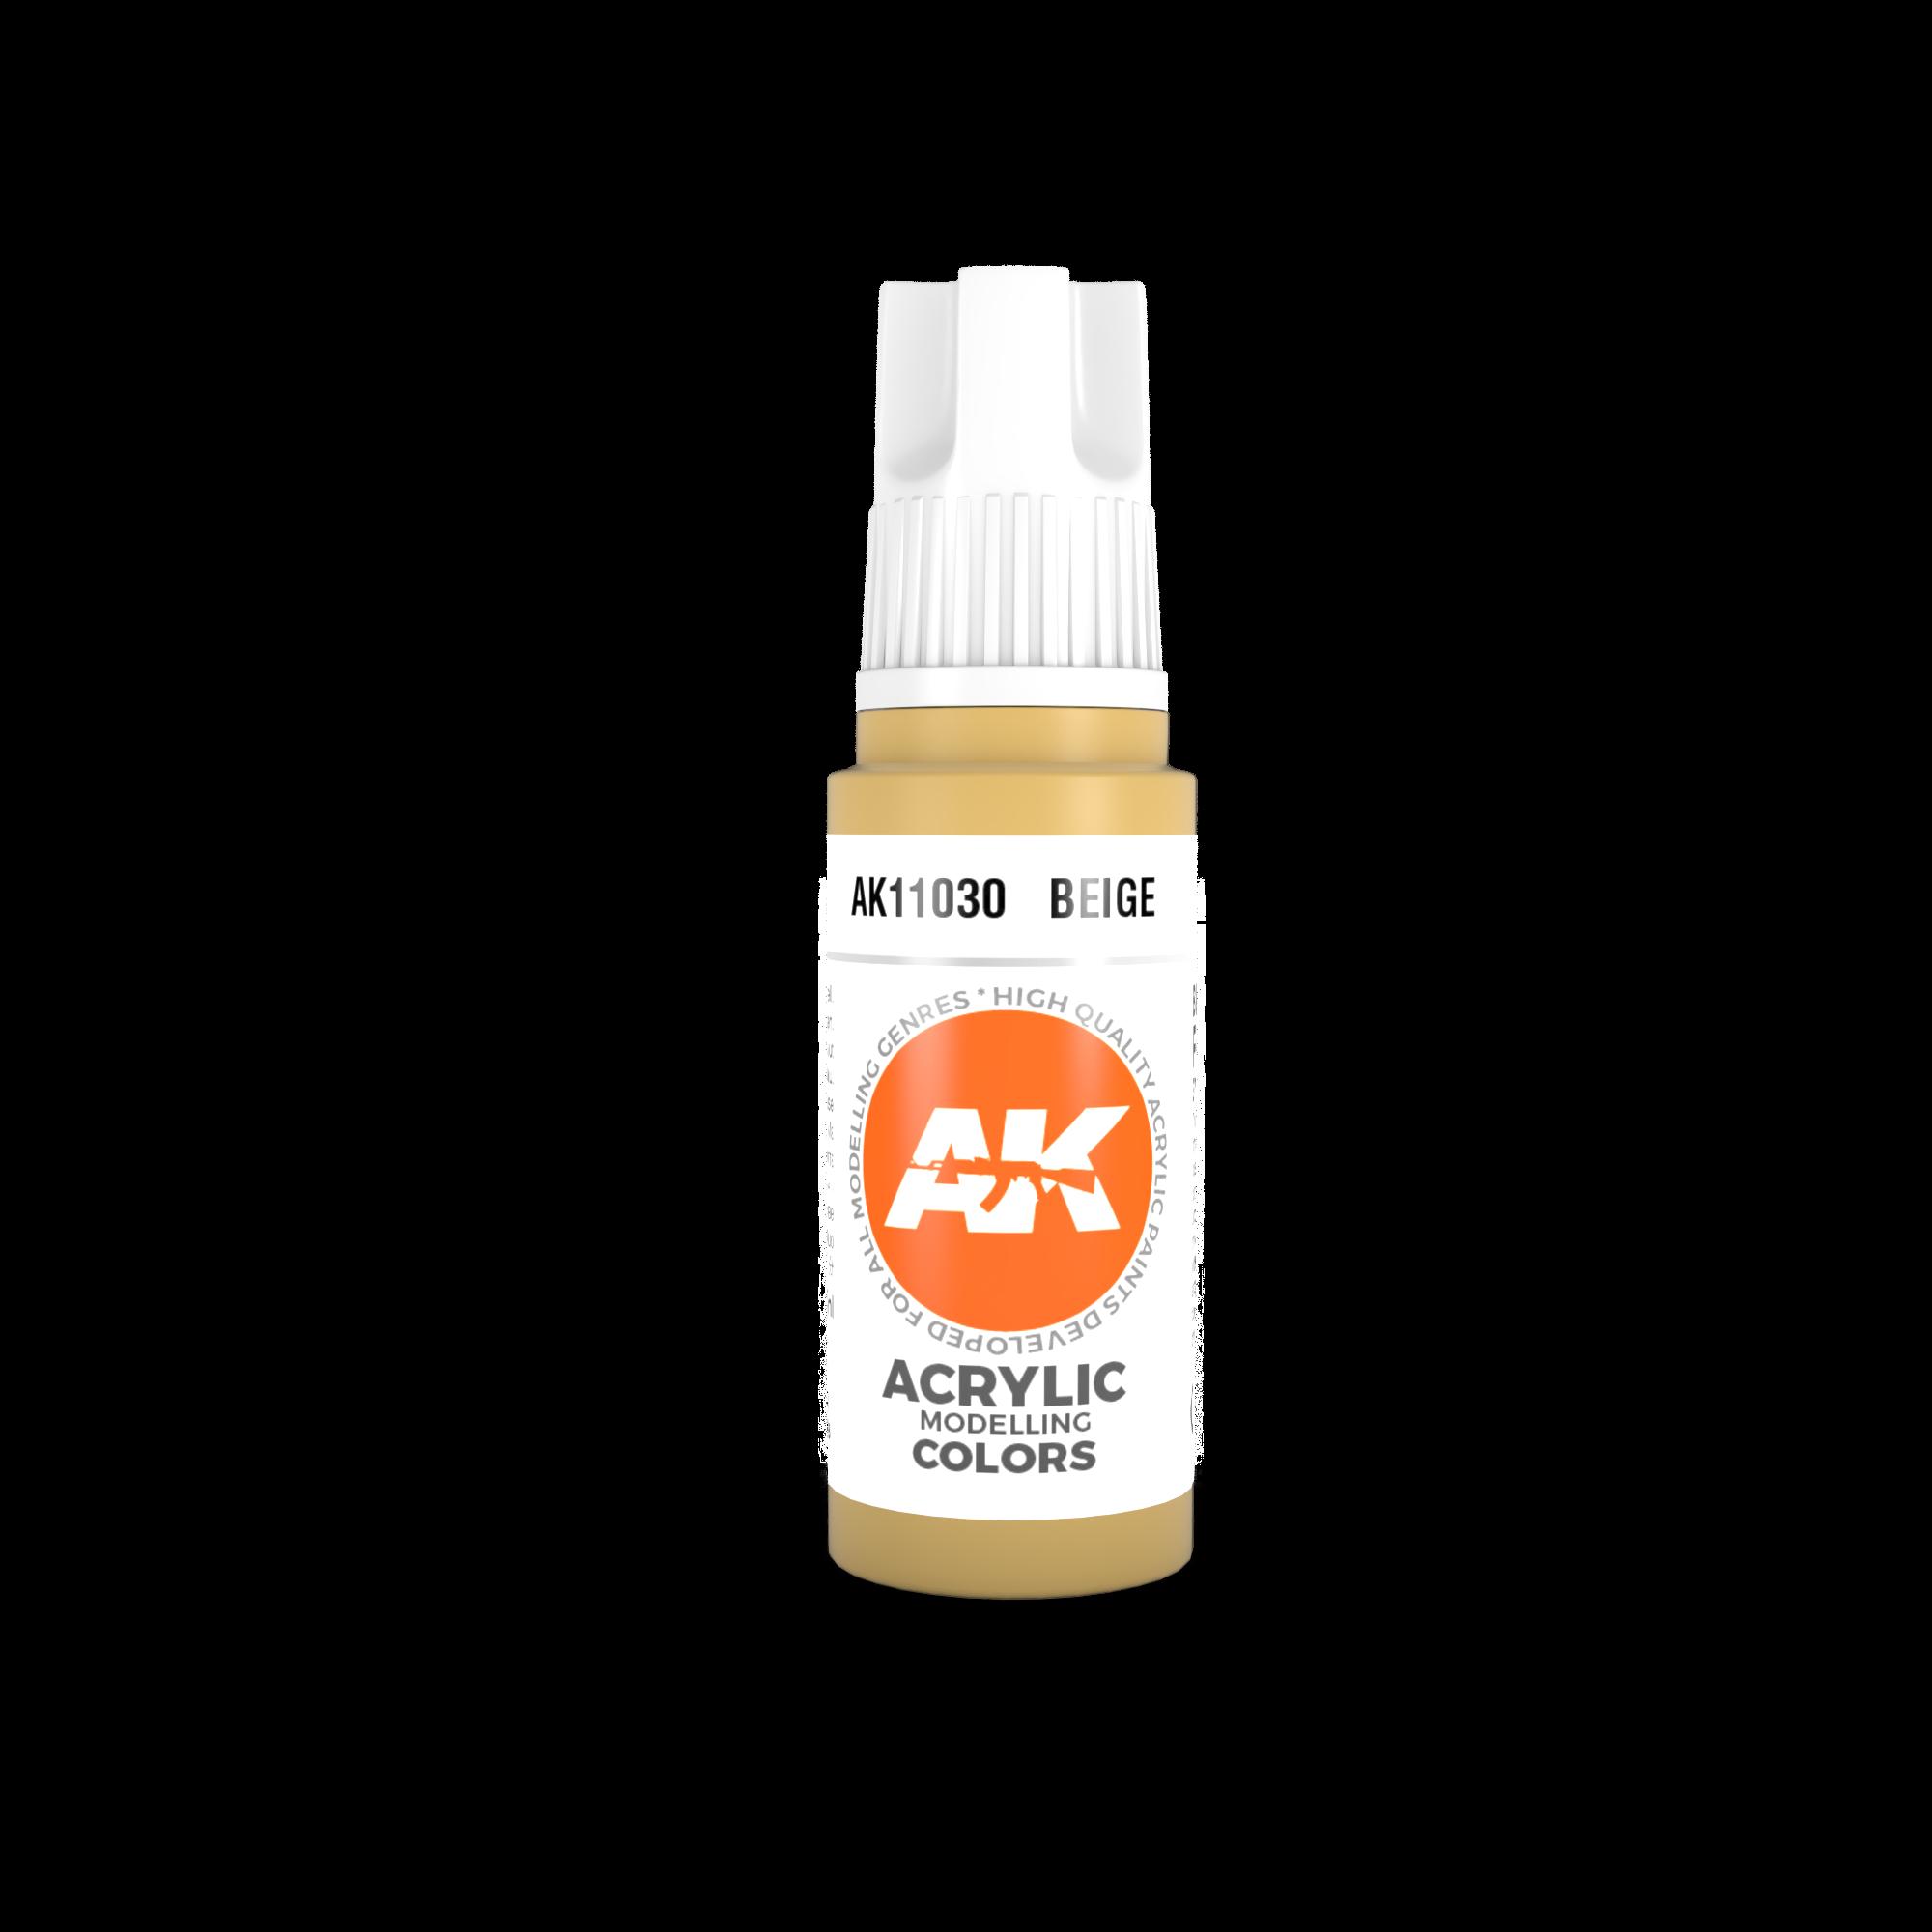 AK-Interactive Beige Acrylic Modelling Color - 17ml - AK-11030